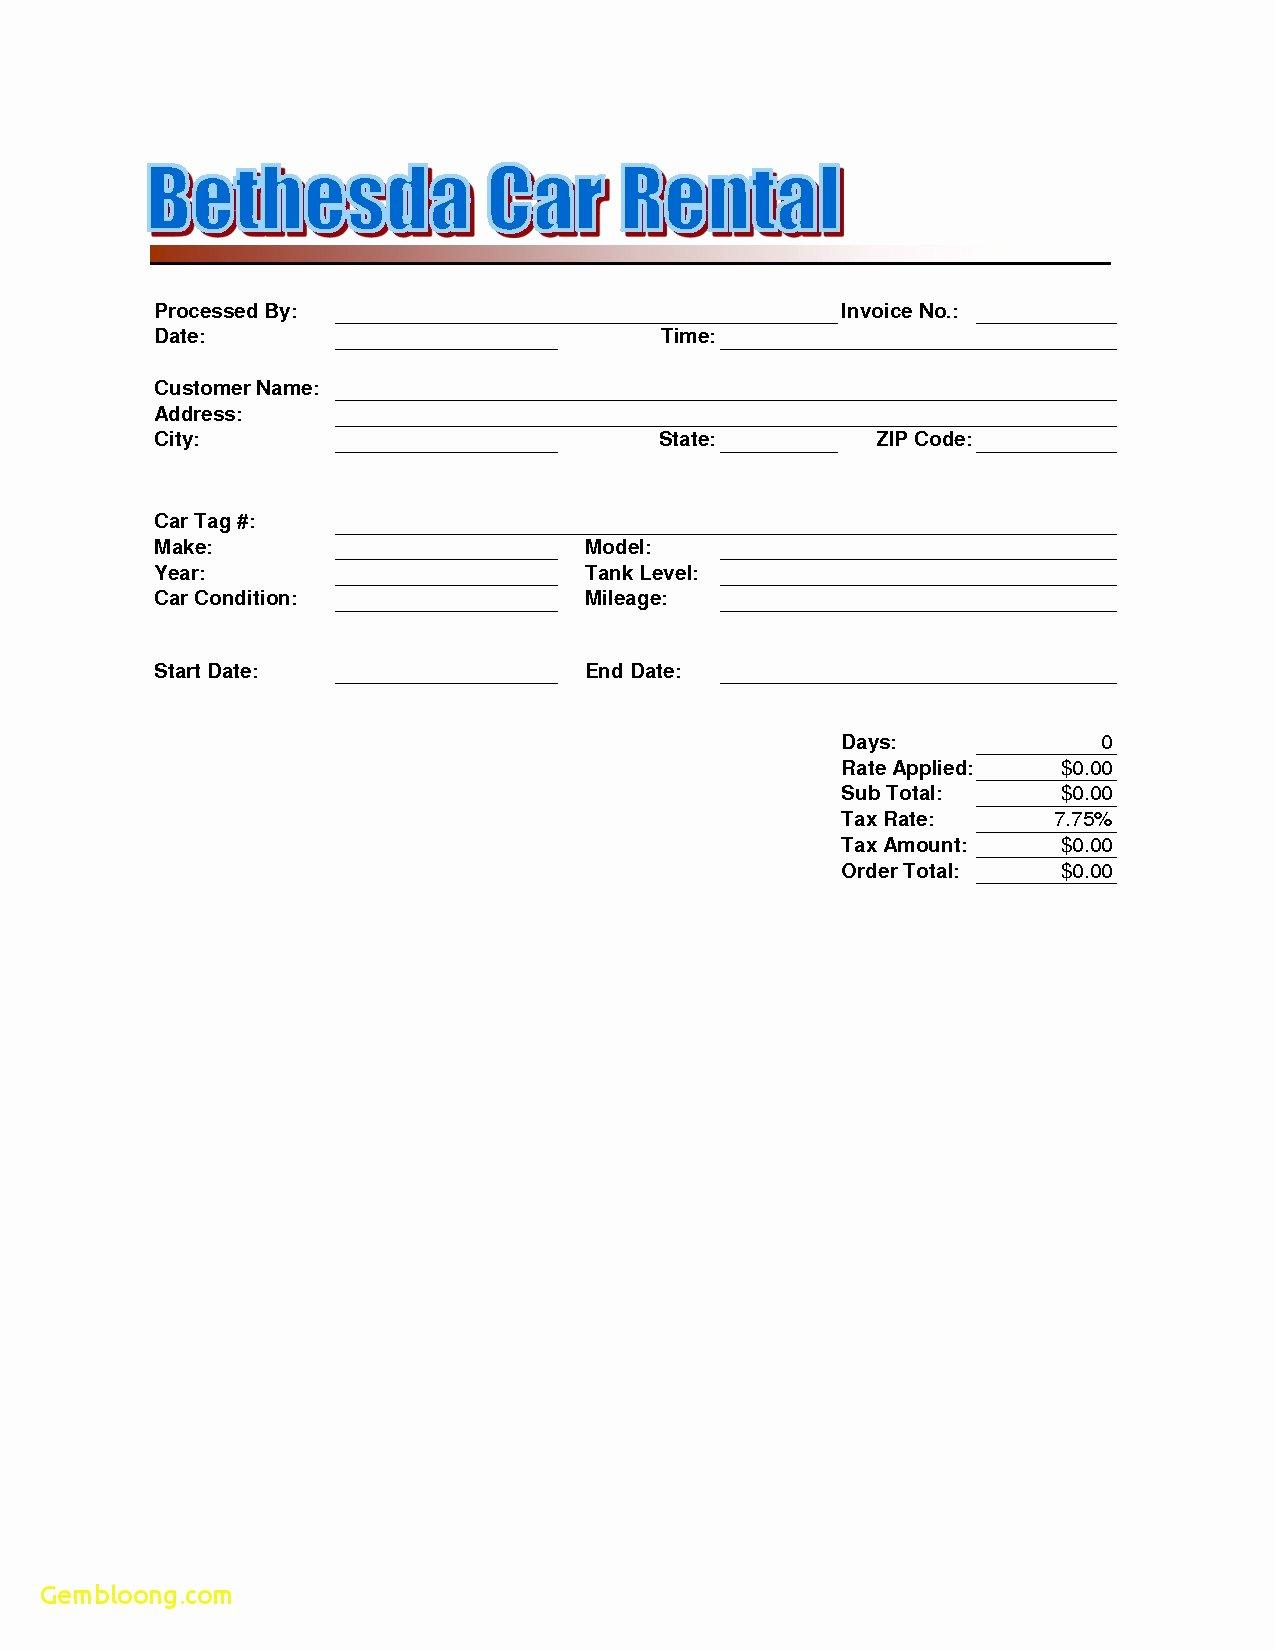 Car Rental Receipt Template Fresh 19 Car Rental Invoice Steamtraaleren Borgenes